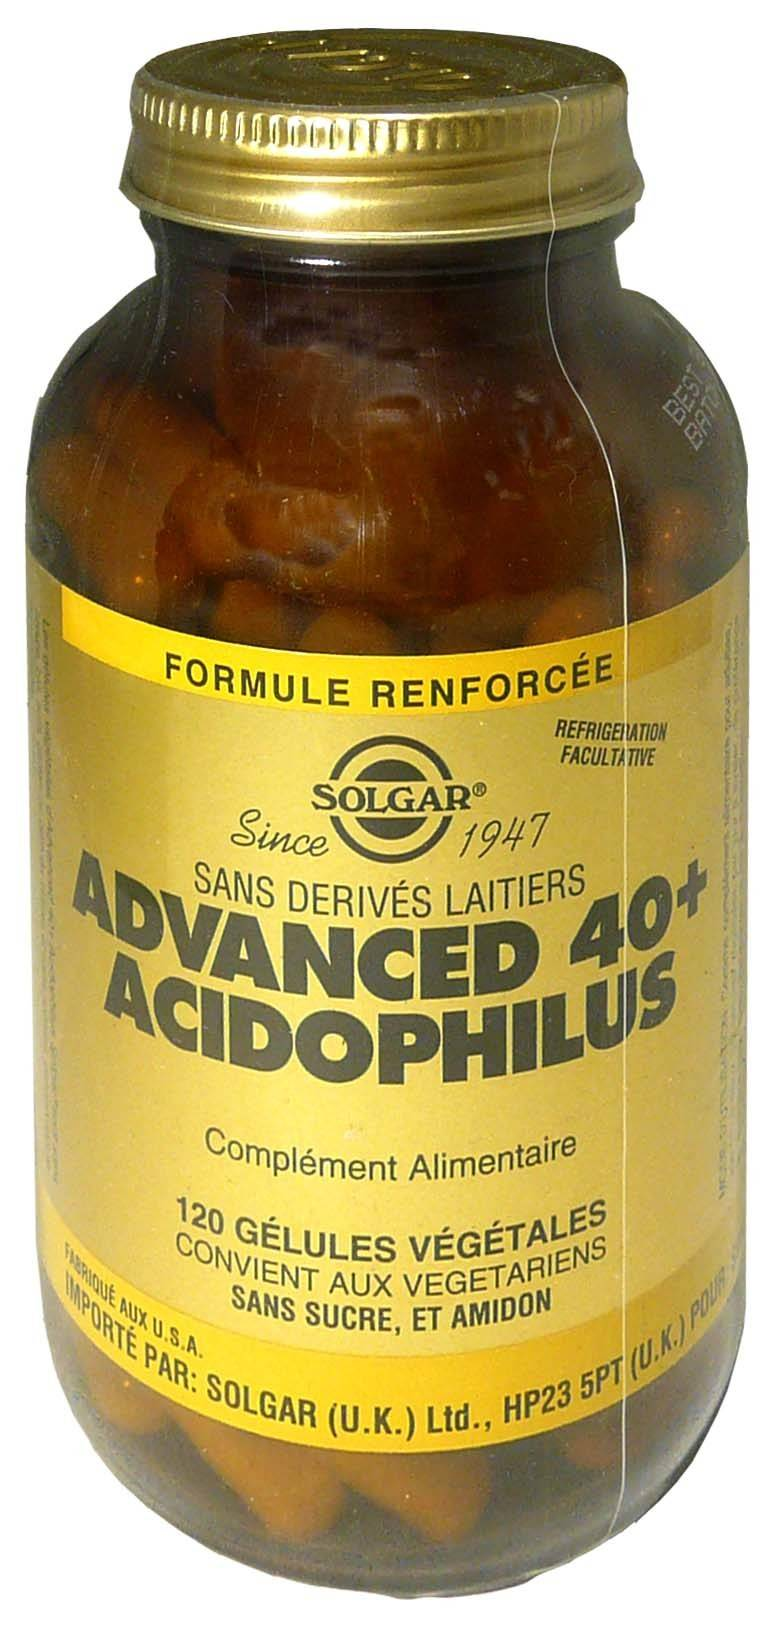 Solgar advanced 40+ acidophilus 120 gelules